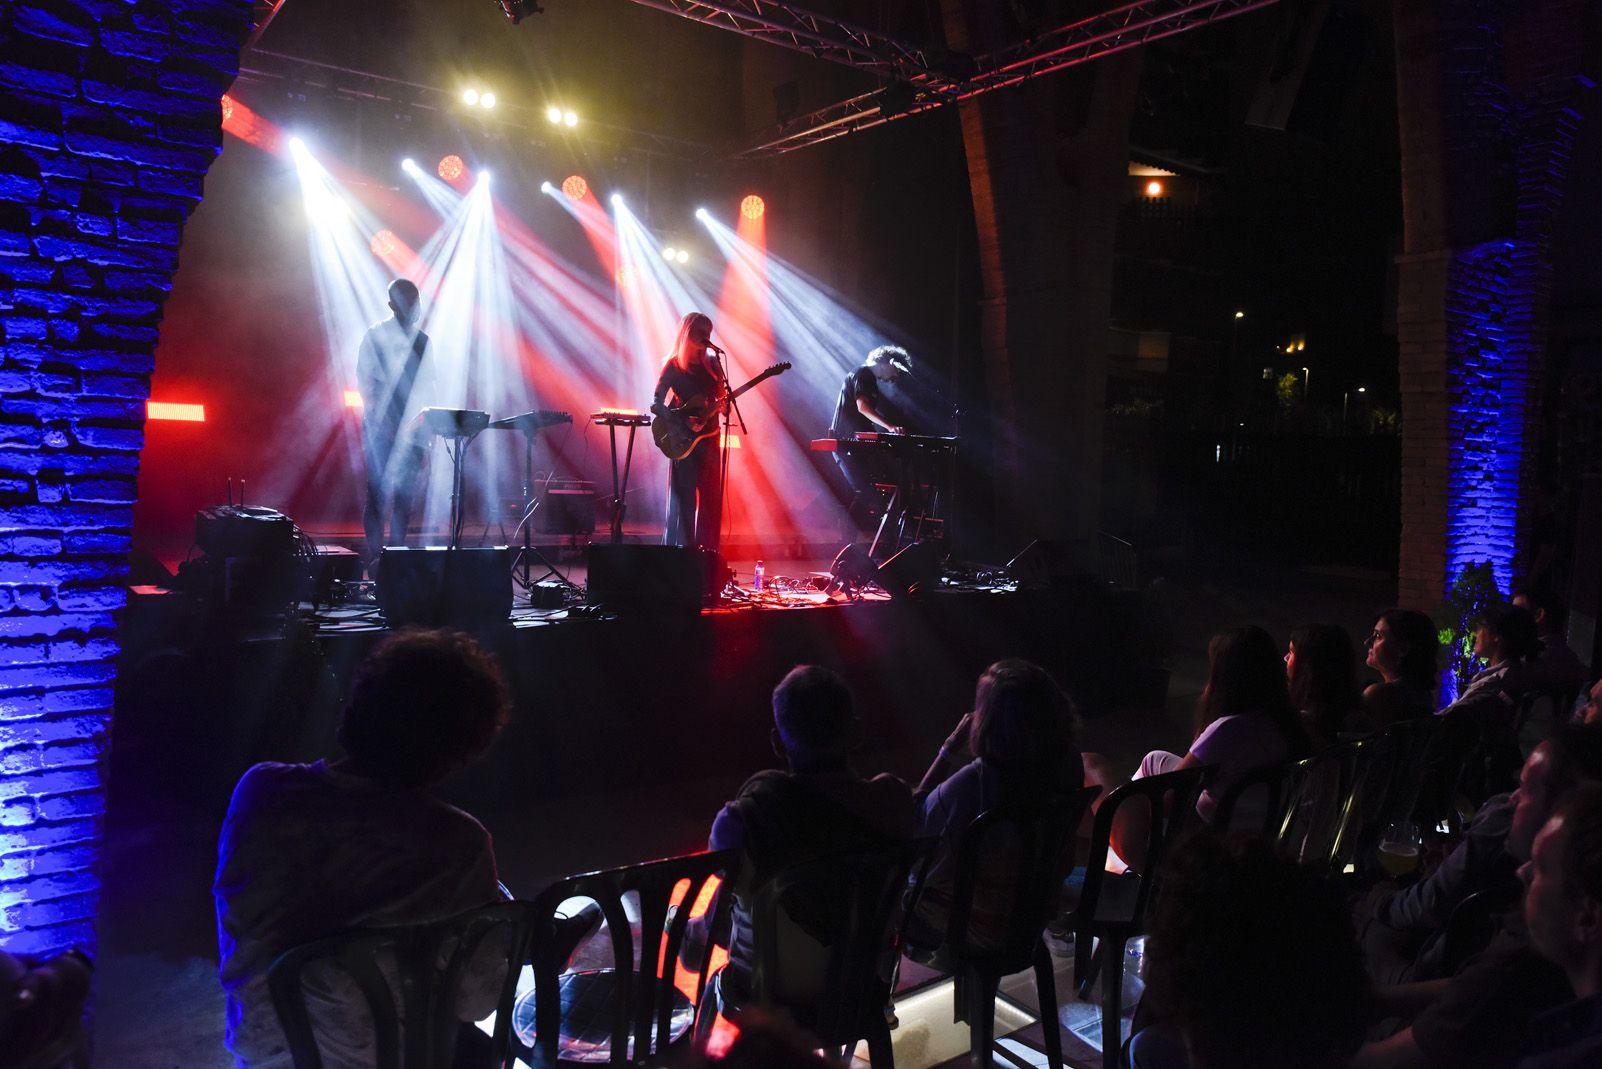 Festival Vincles al Celler Modernista. Foto: Bernat Millet.